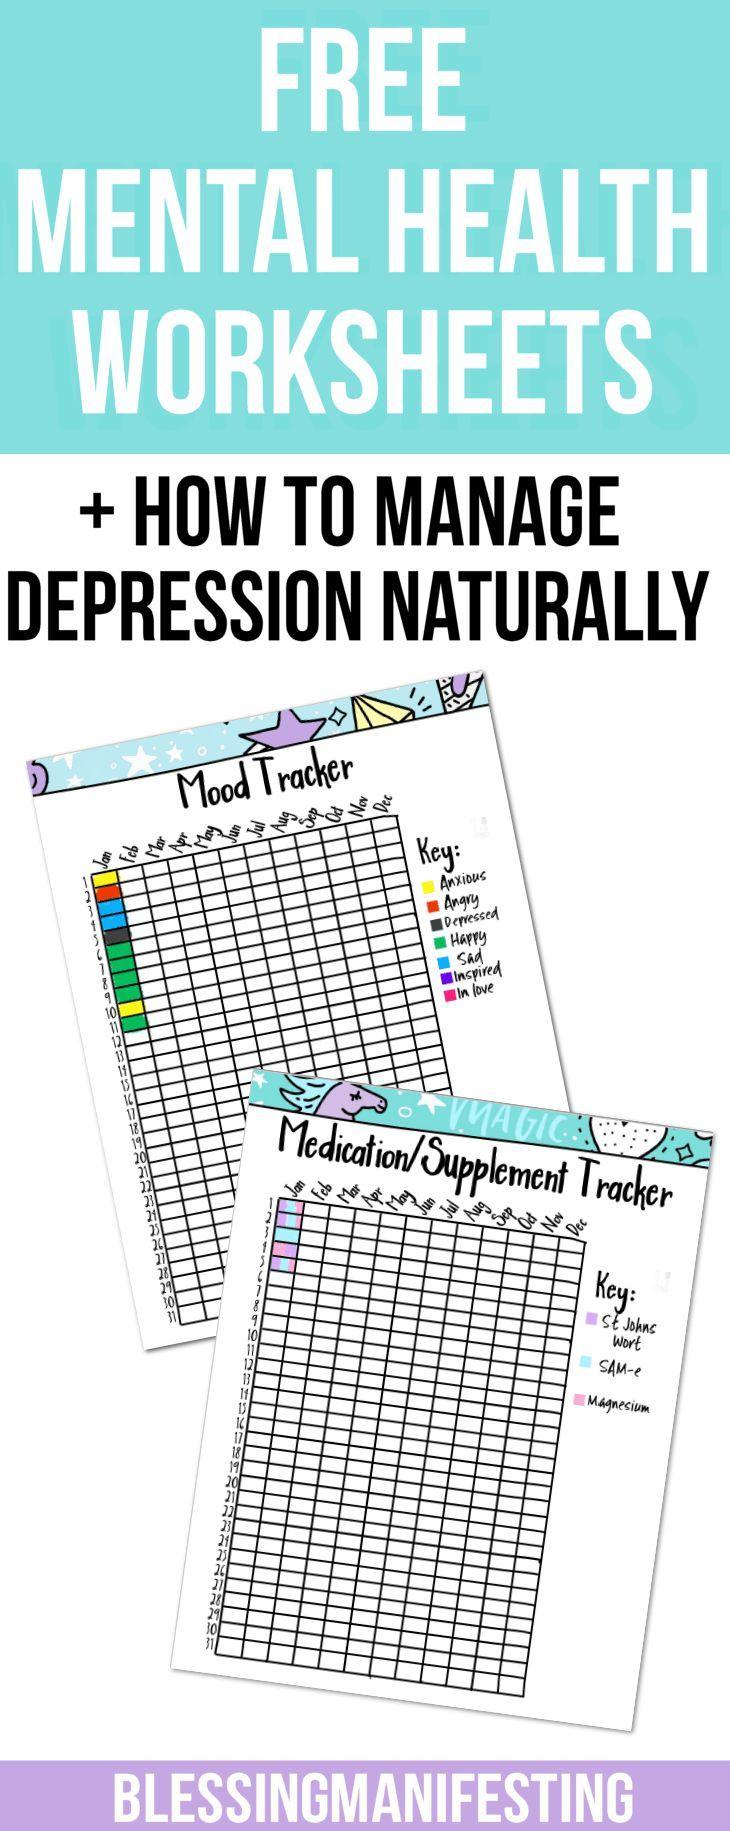 How to manage #depression naturally #Bulletjournaling #mentalhealth #mentalhealthtracker #mentalhealthworksheet